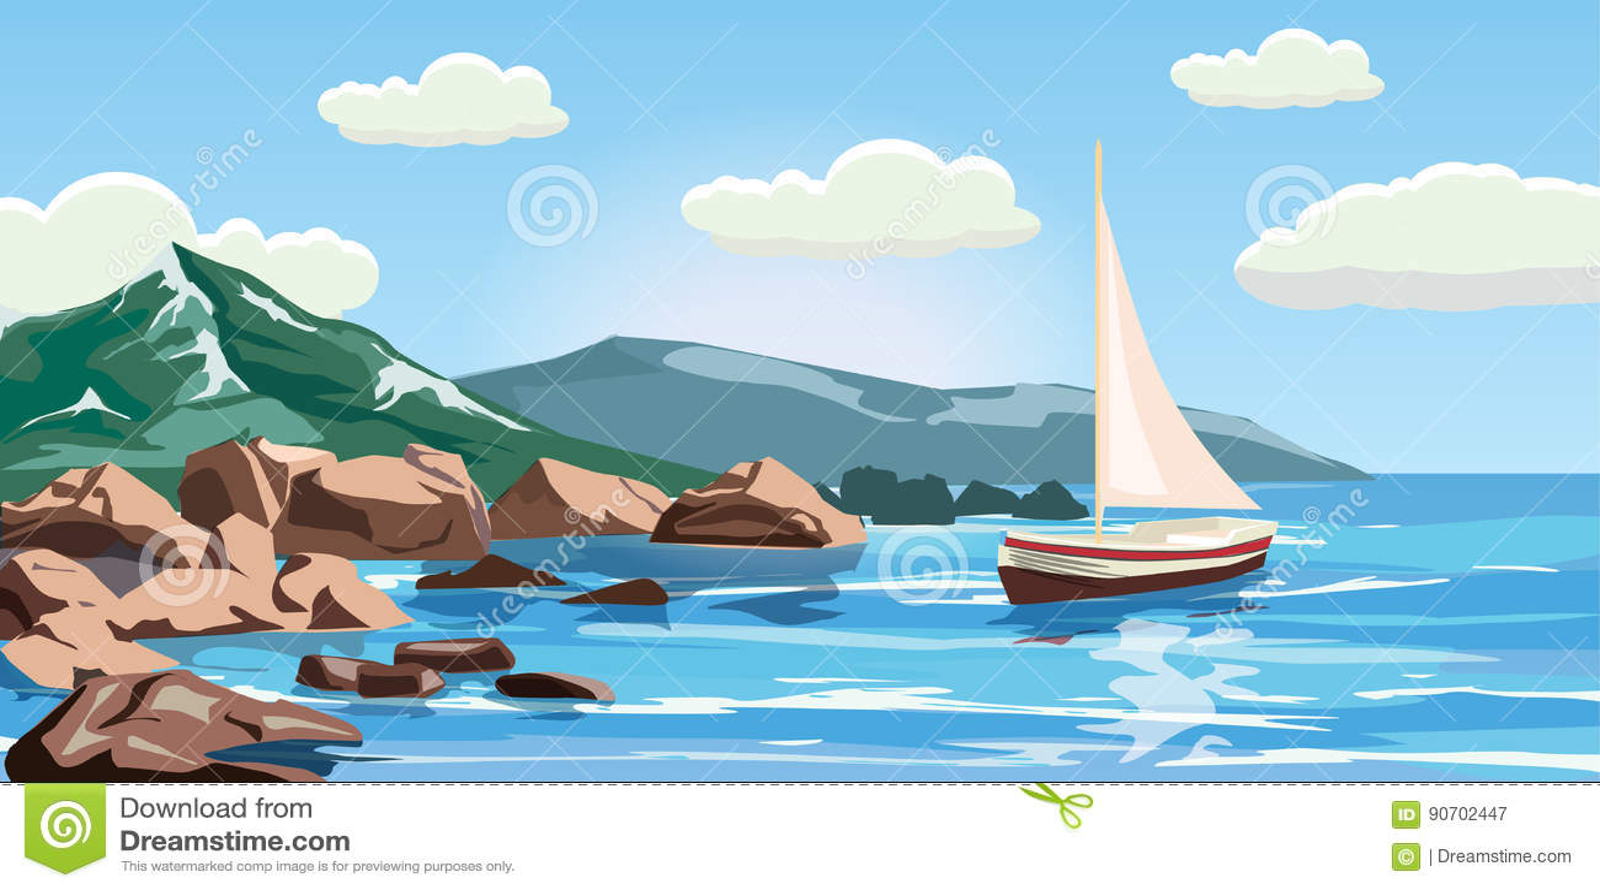 Seascape, rocks, cliffs, a yacht under sail, ocean